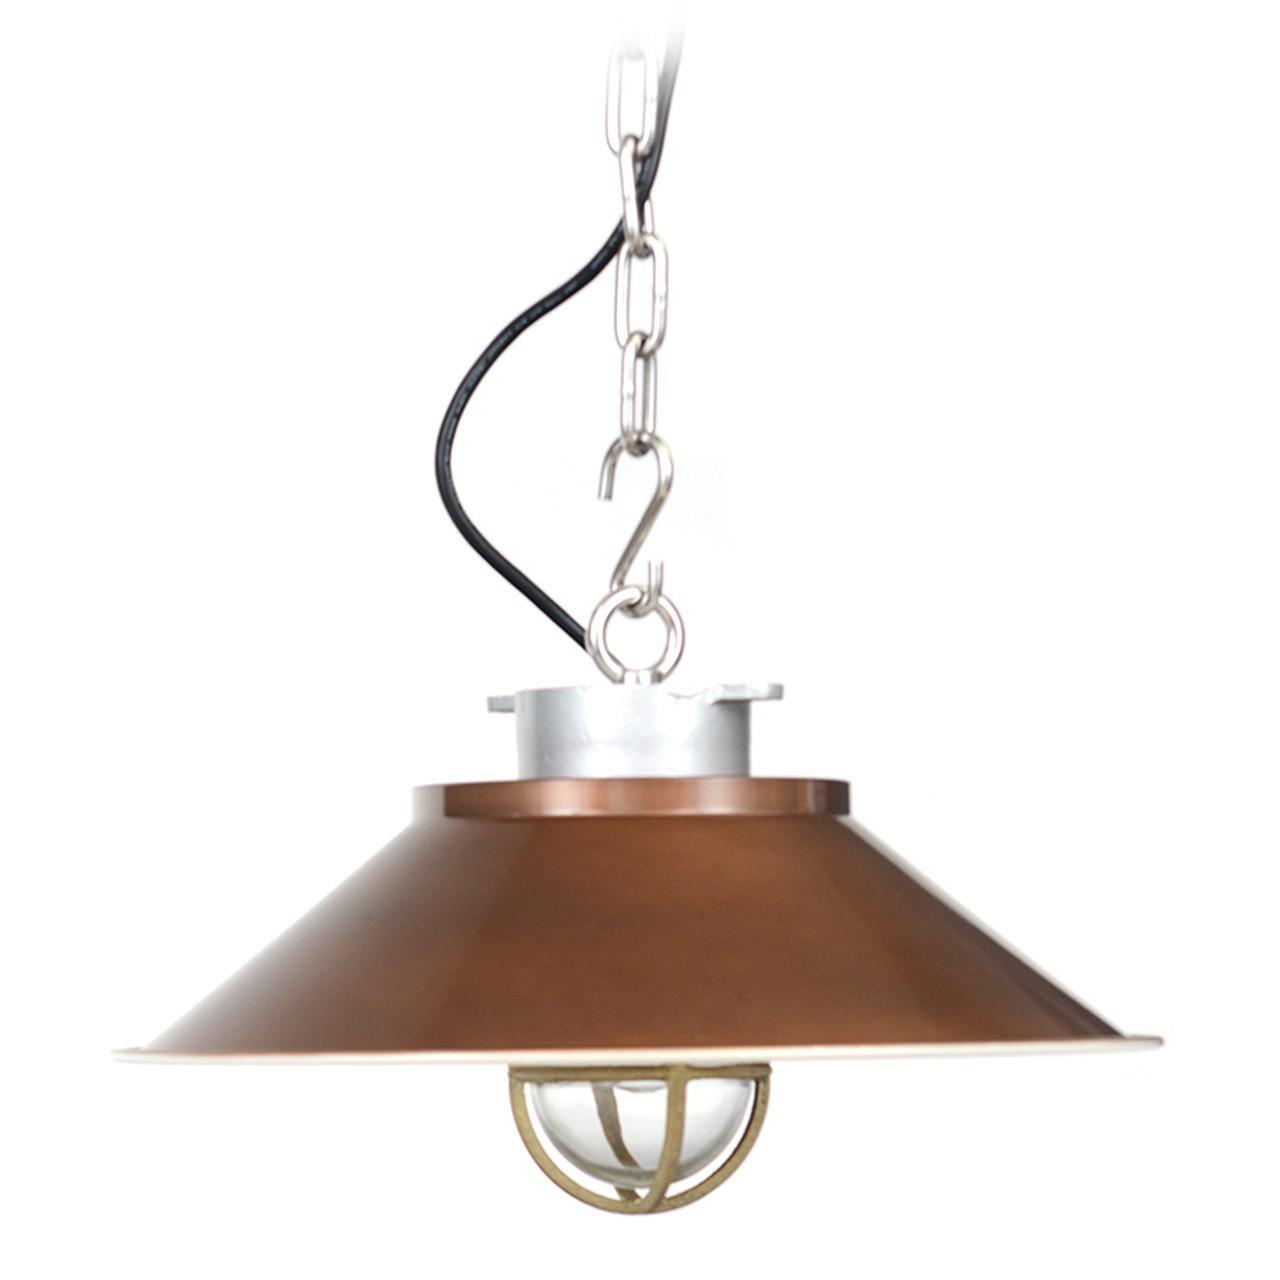 Devonport Nautical Pendant Light   Vintage Brass